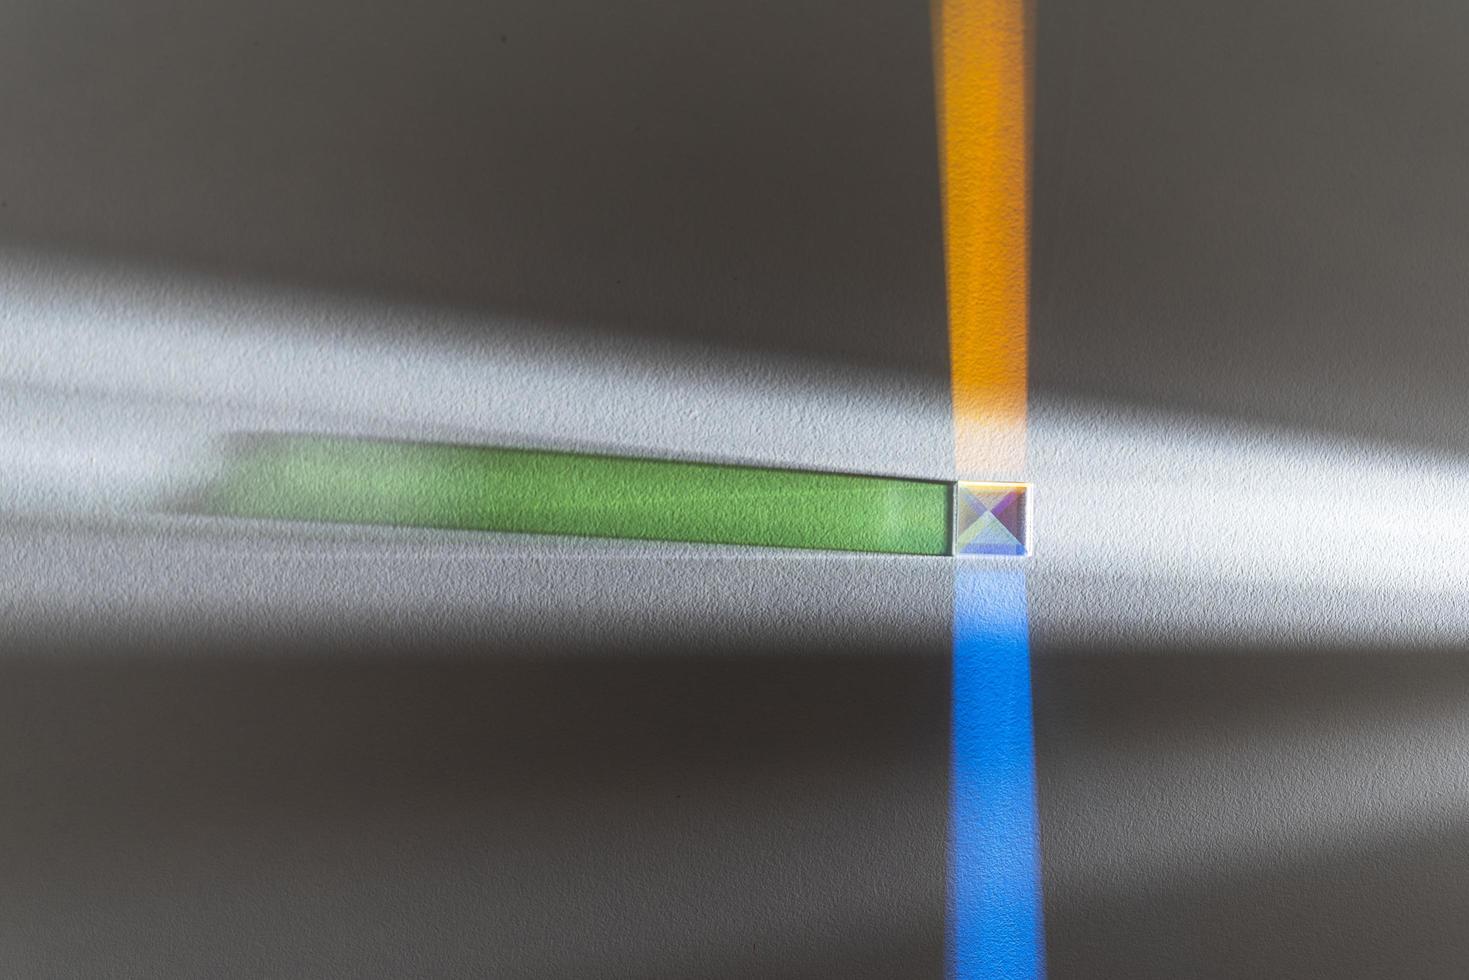 färgglada ljus prismor reflektion bakgrund foto